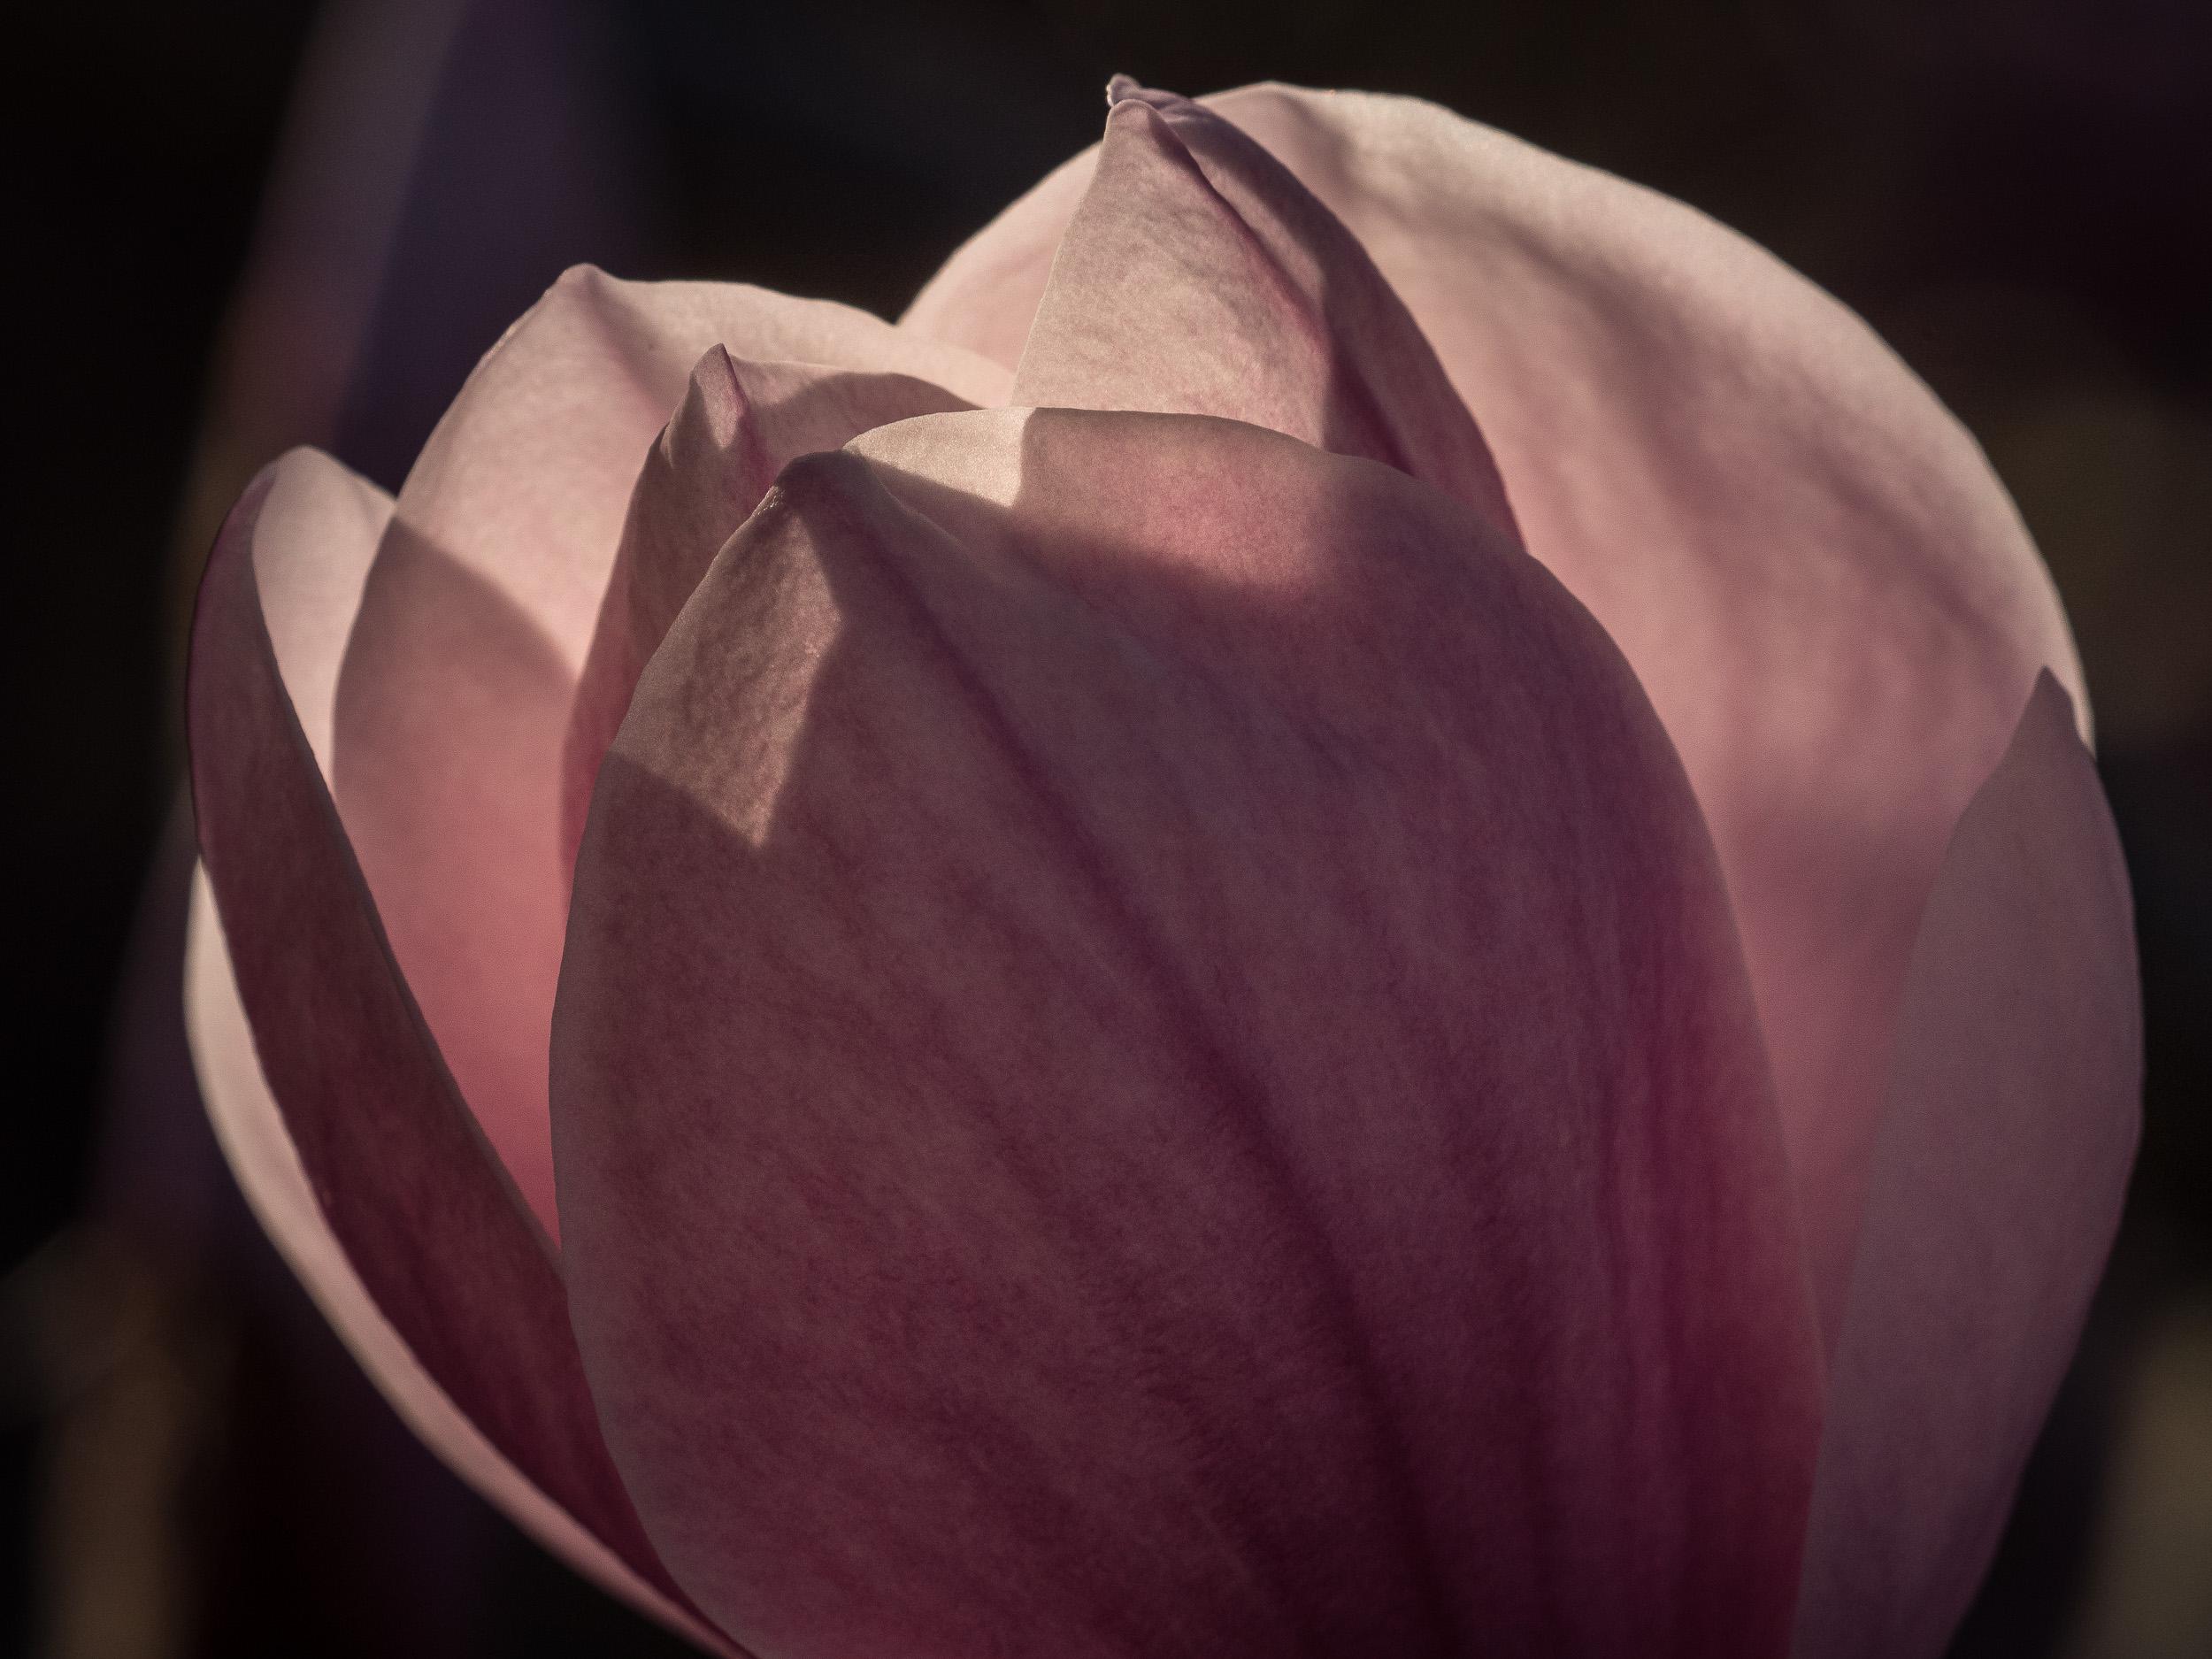 20170330_panasonic_gh5_magnolien_1004784.jpg